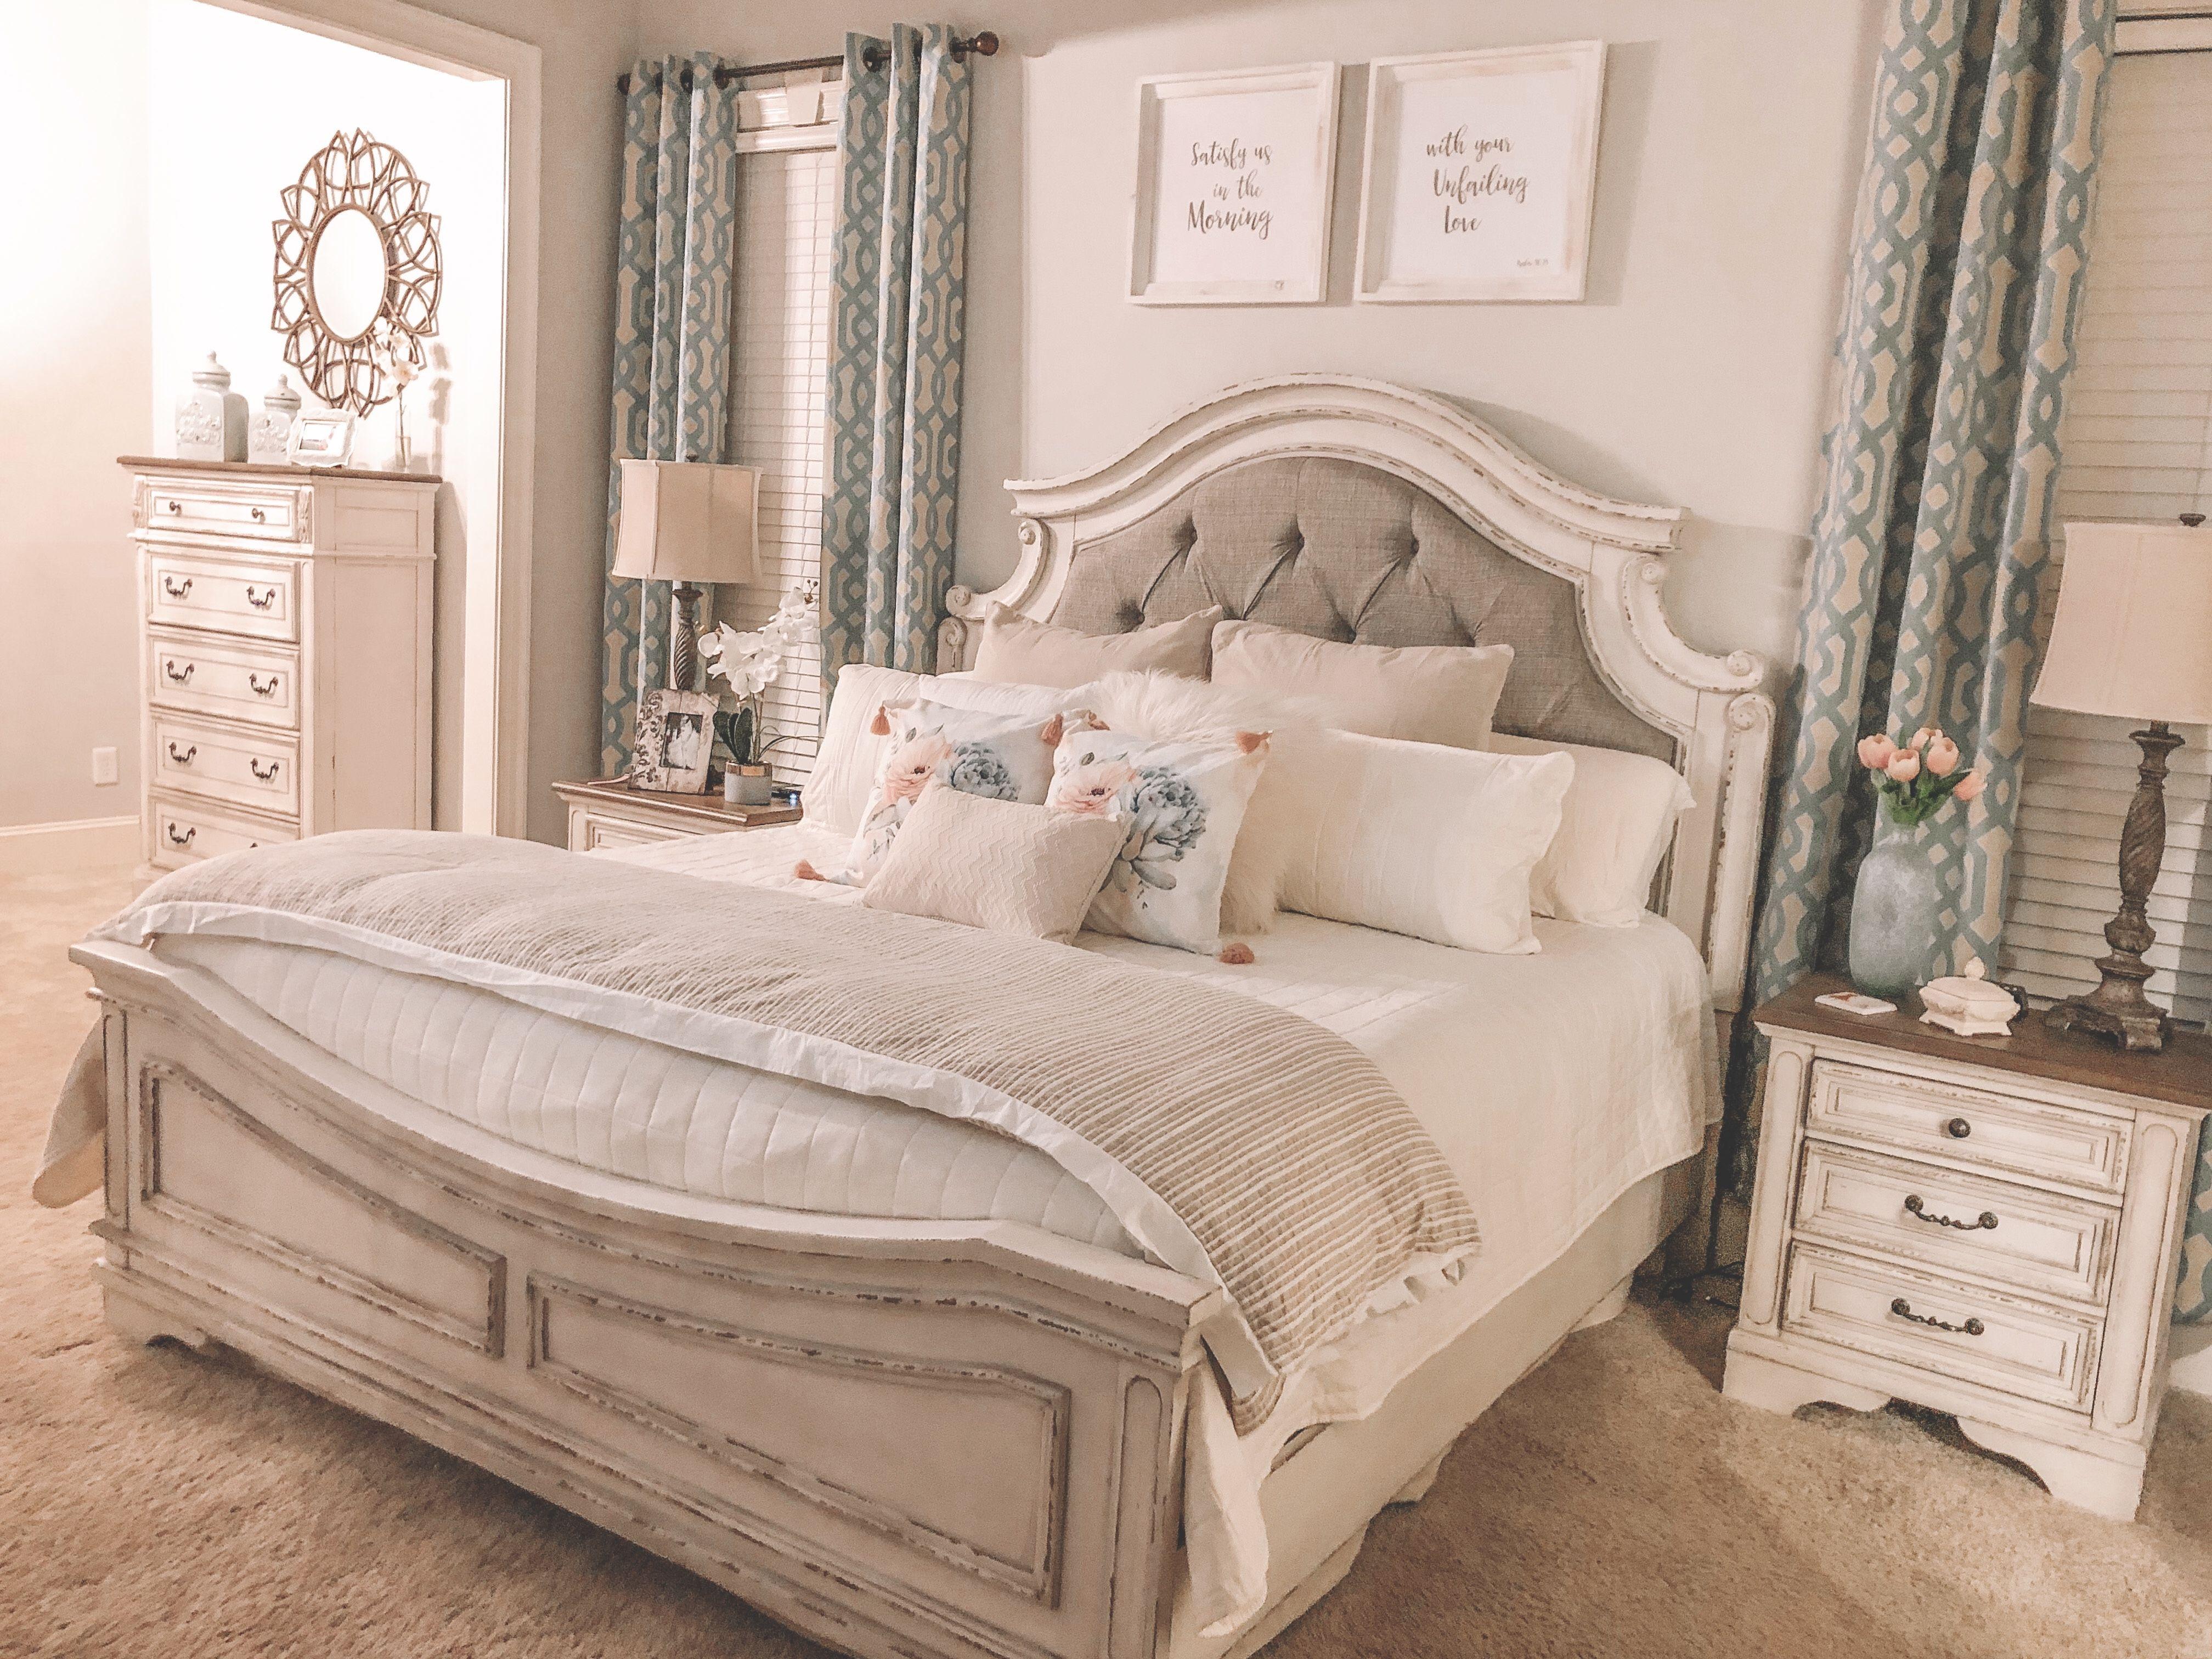 12+ Ashley realyn bedroom furniture ideas in 2021